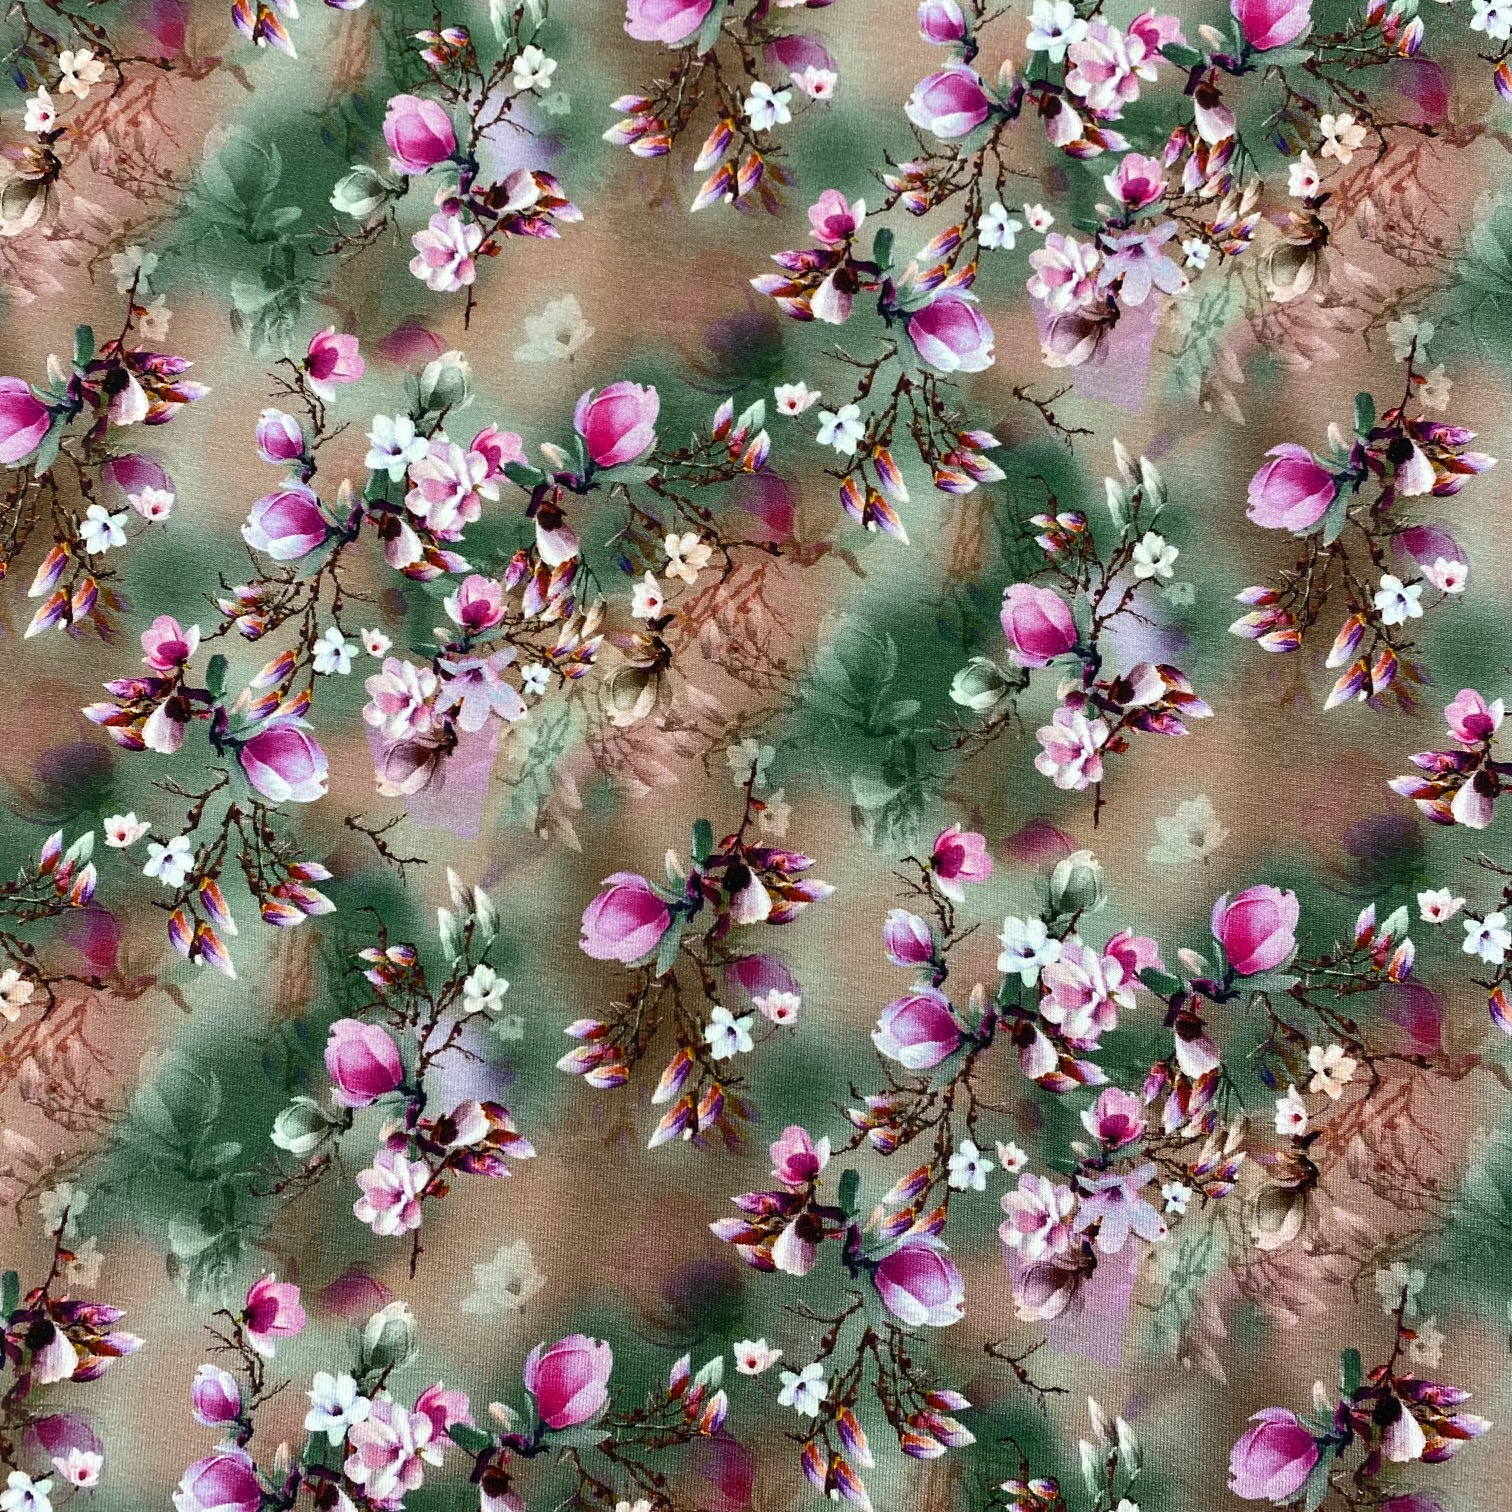 Viskosenjersey, zarte Blumen, Digital Druck. Art. 4991-1518